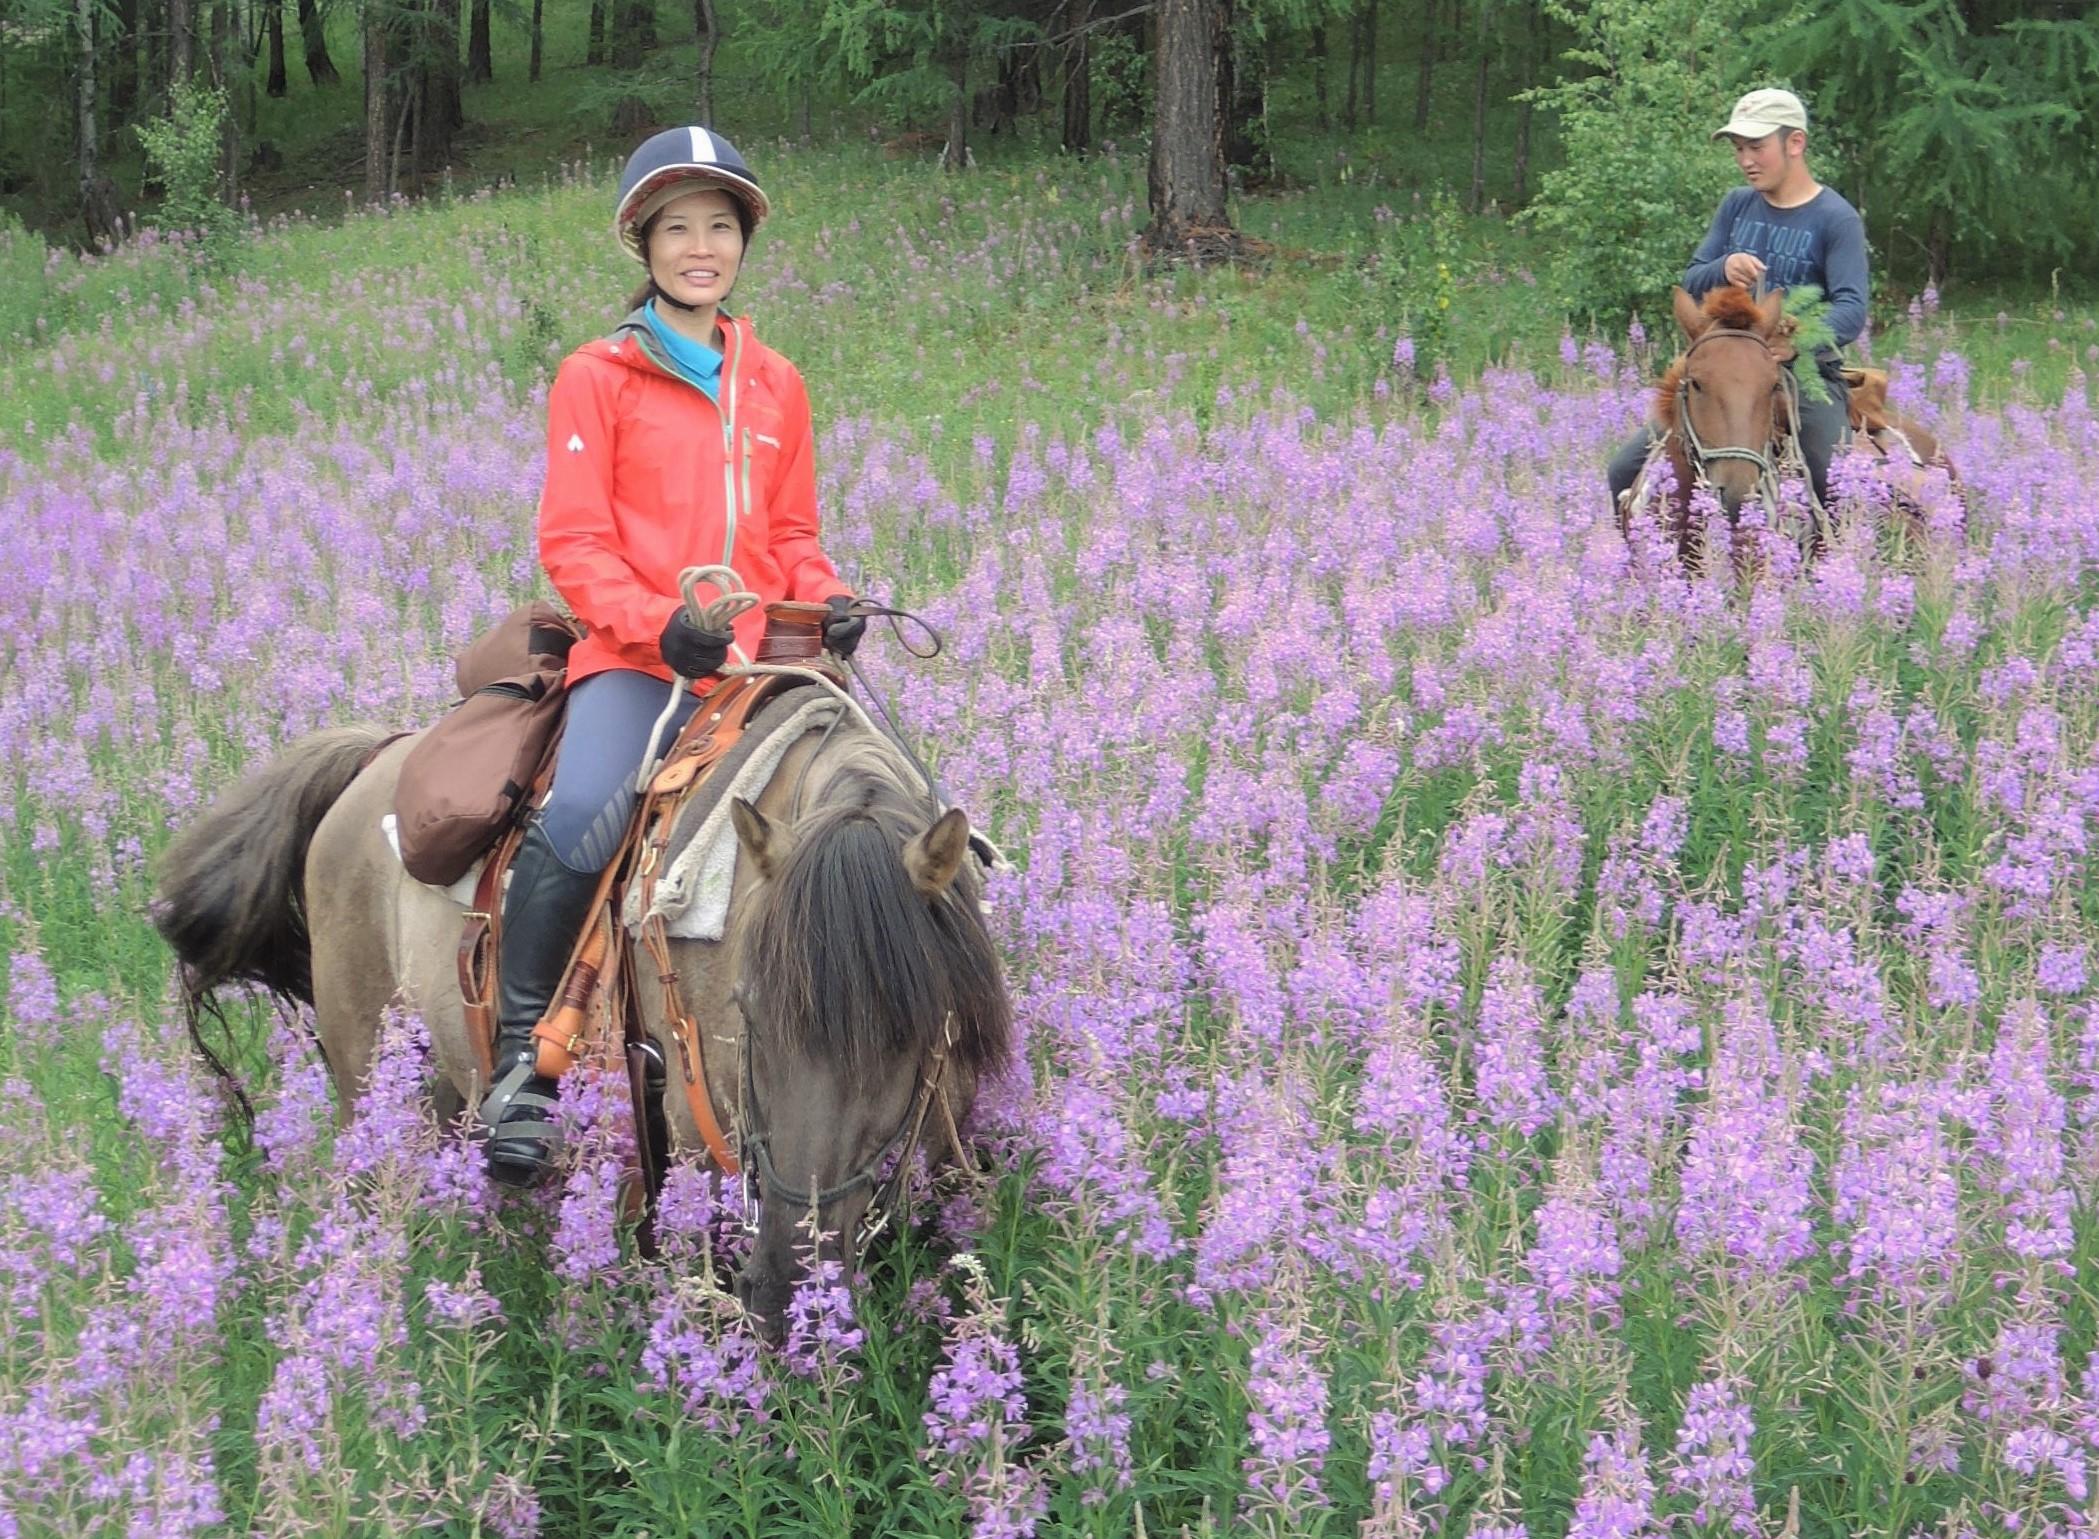 Riding Adventures in Mongolia - Ride, Roam, Rest, Relax, Repeat, Horse Trekking